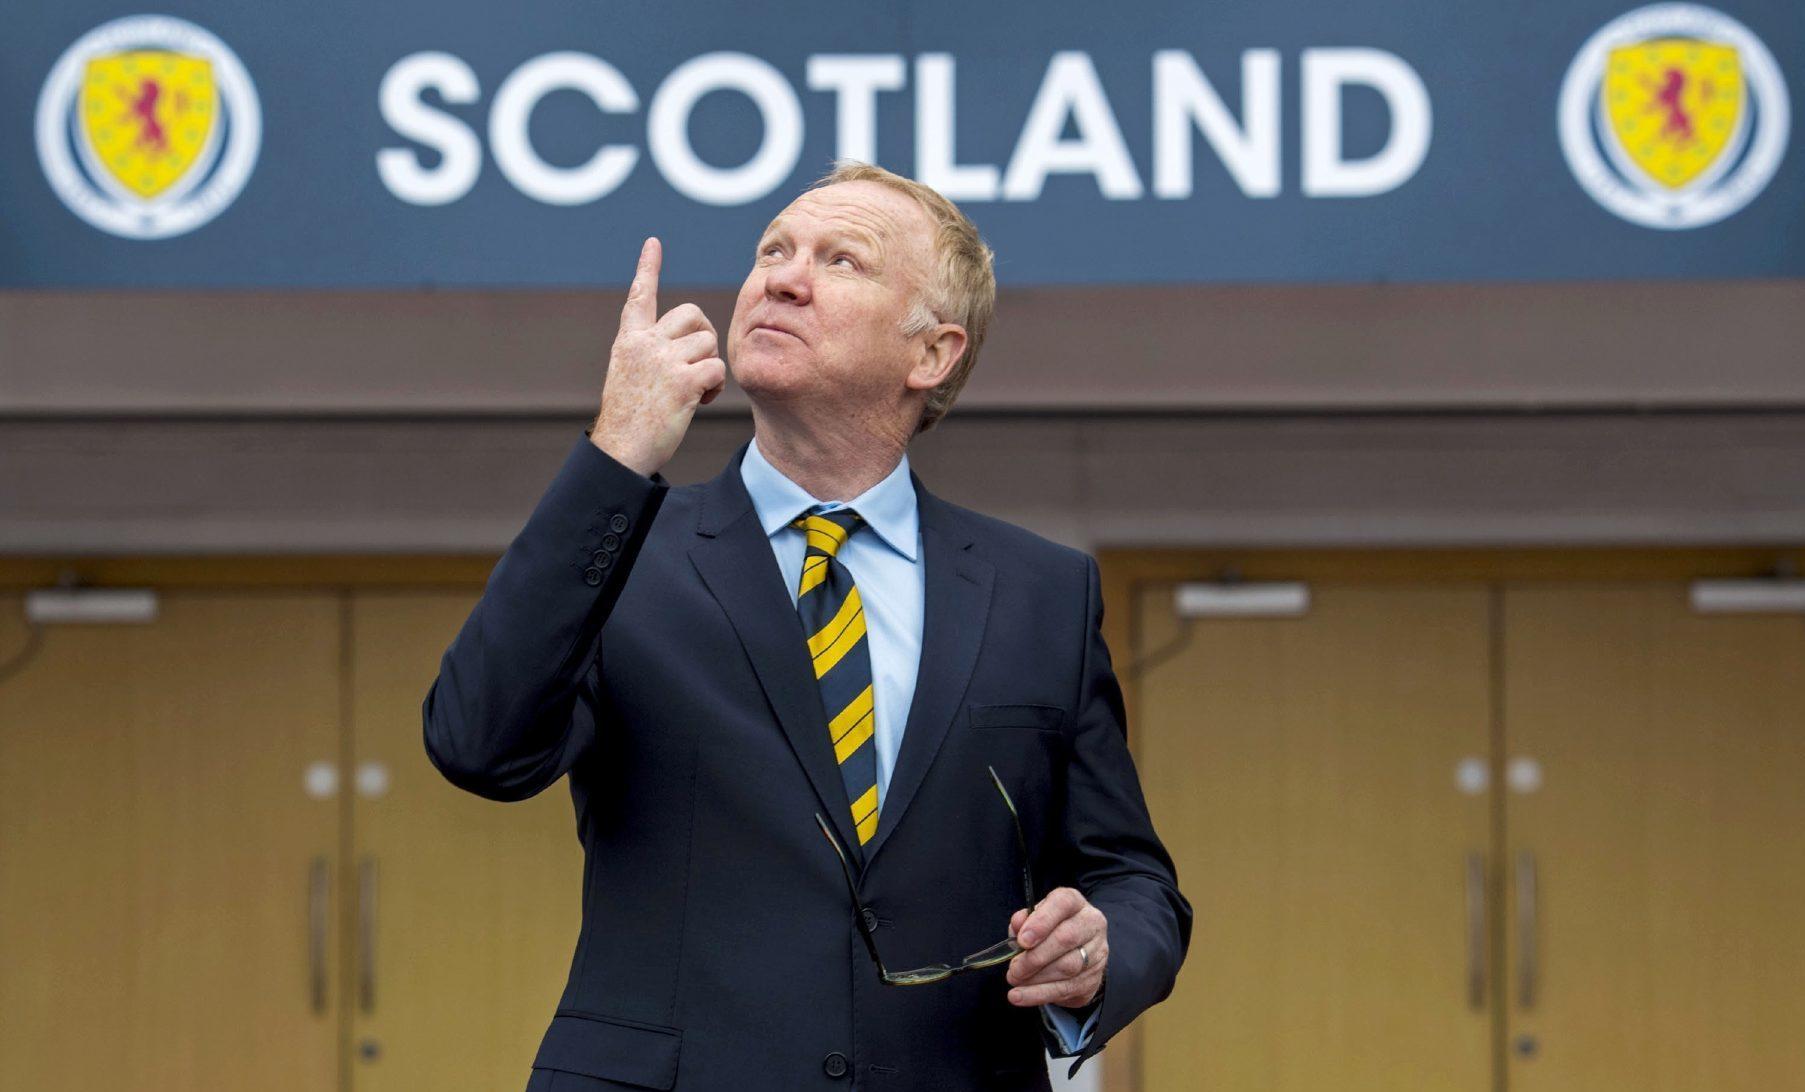 Scotland need to start moving up.